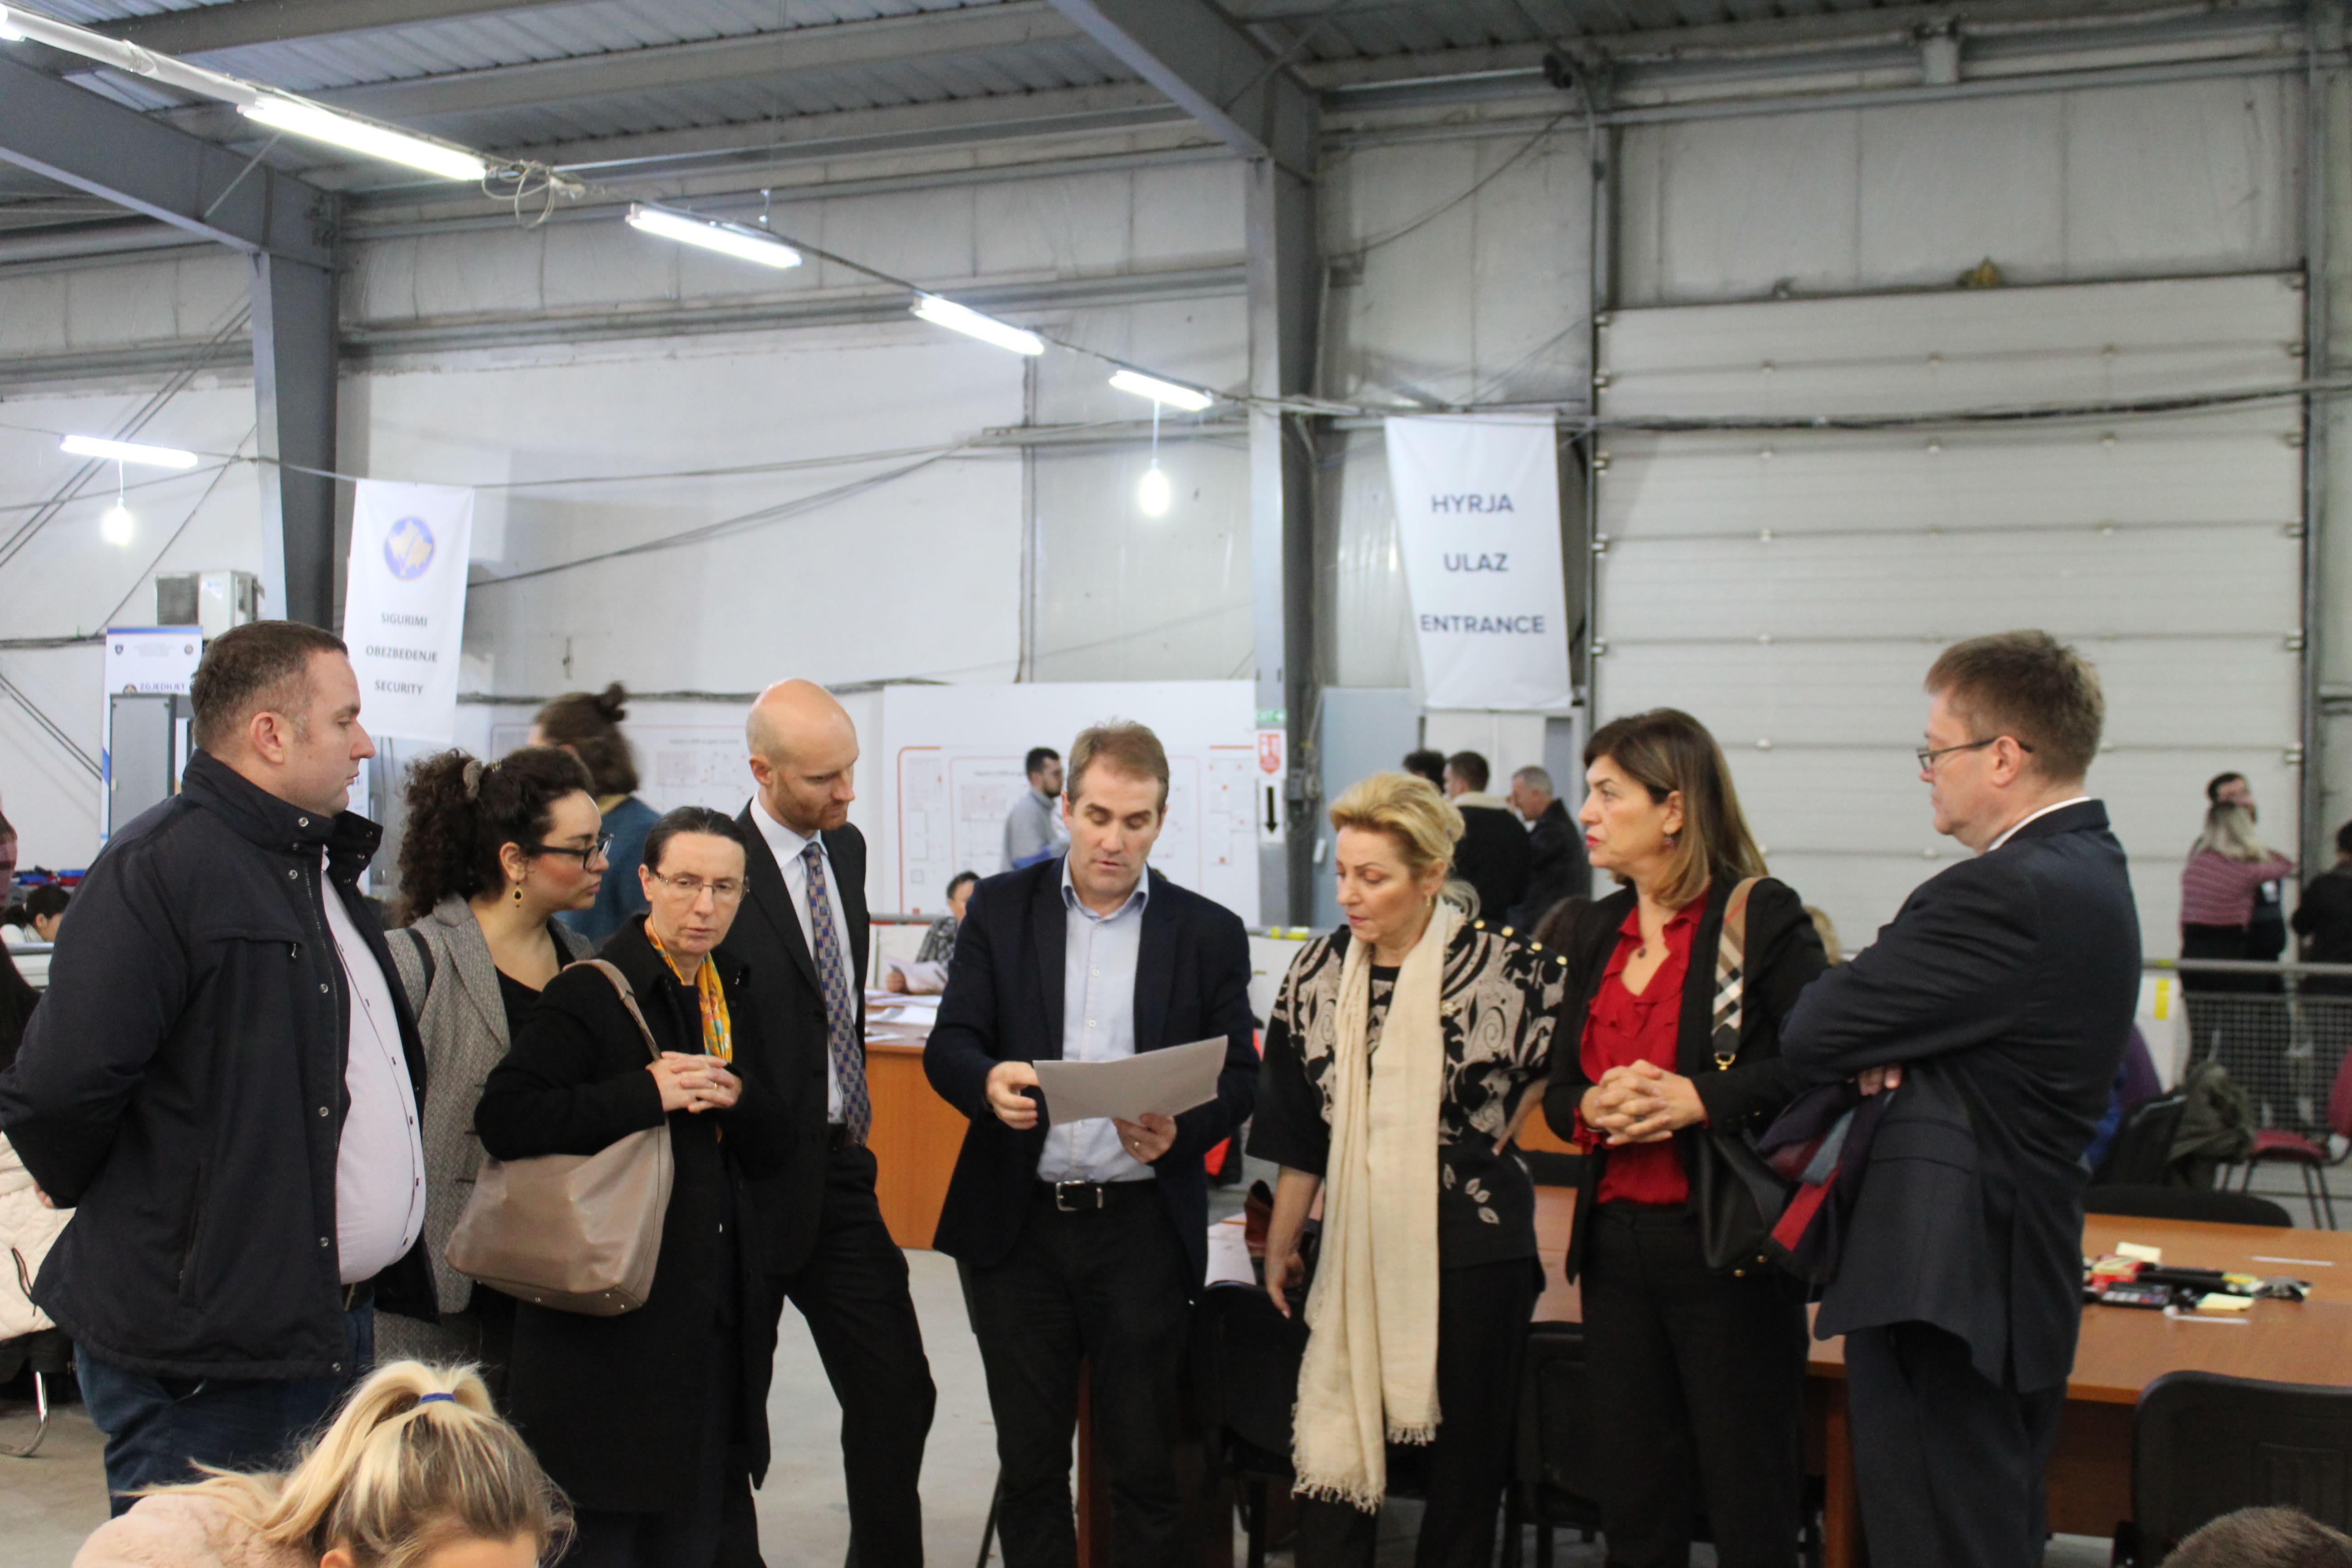 President of the CEC Valdete Daka, invited in CRC ambassadors and representatives of various international organisations